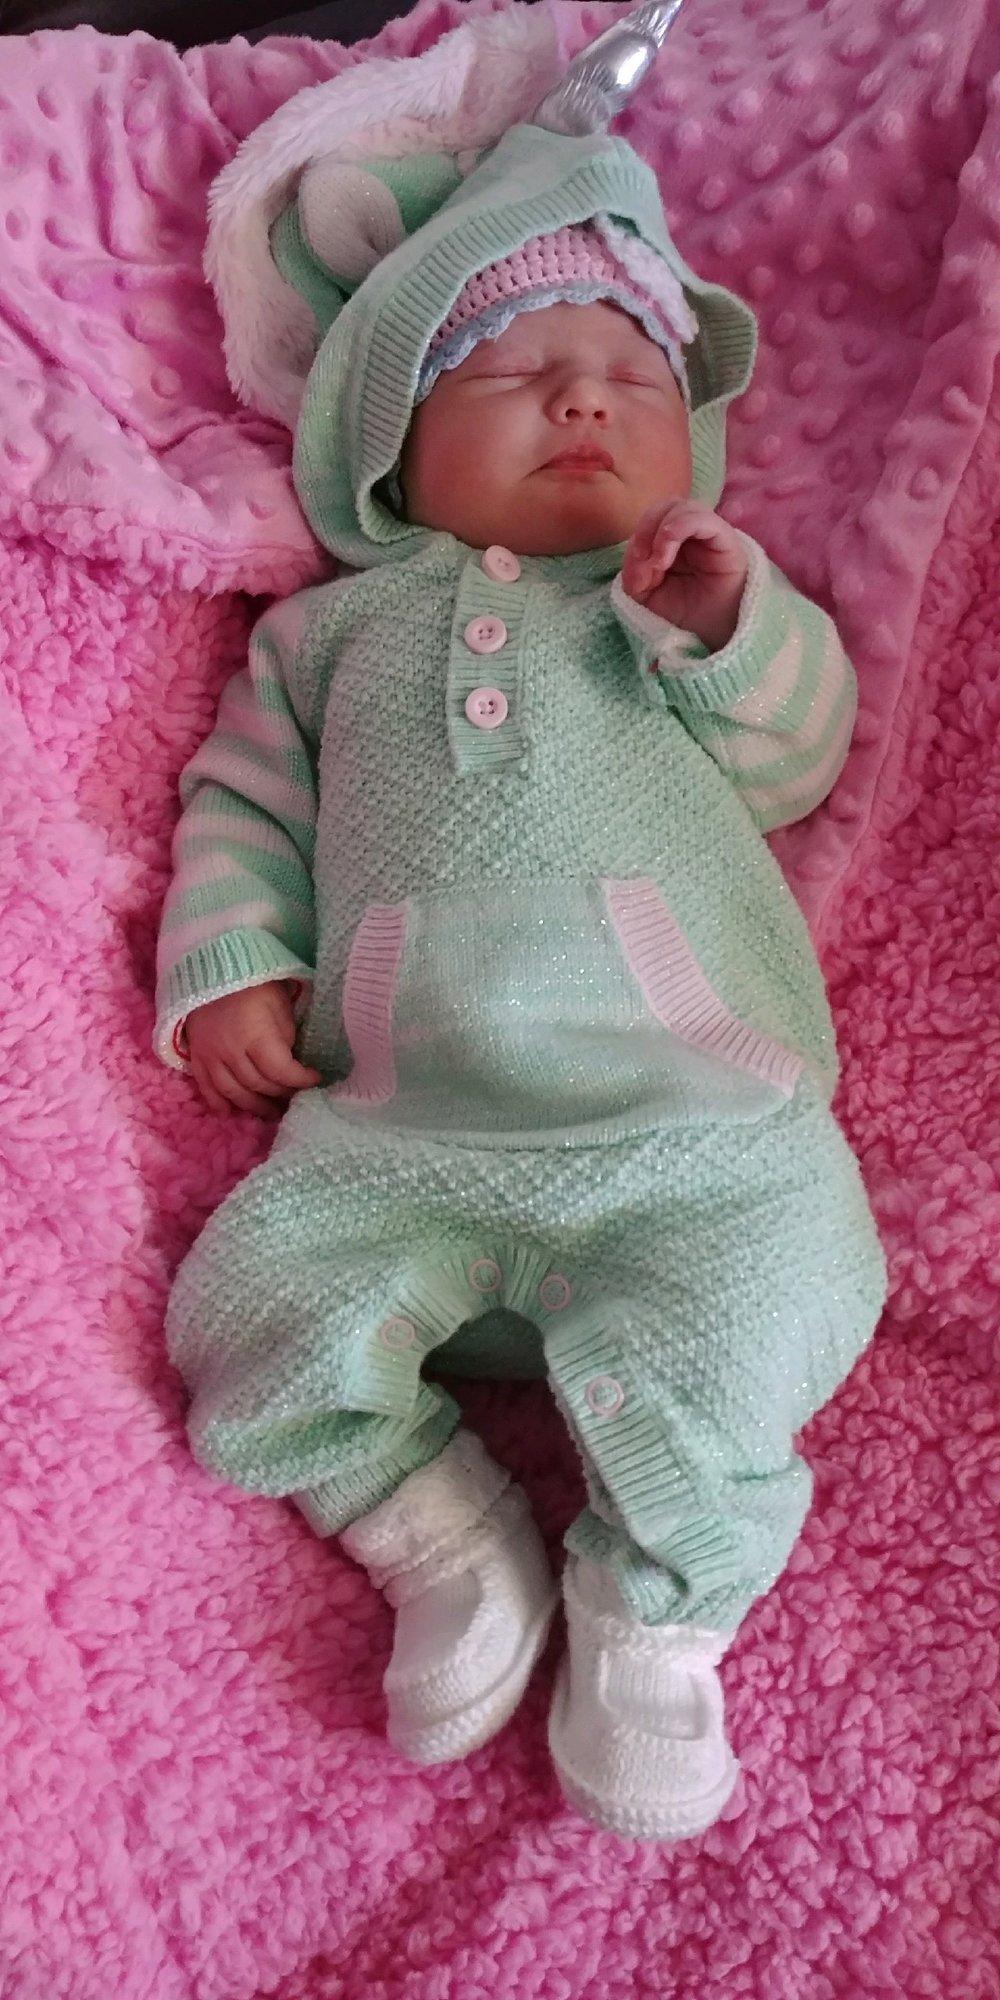 Chloe Marta - Born January 30